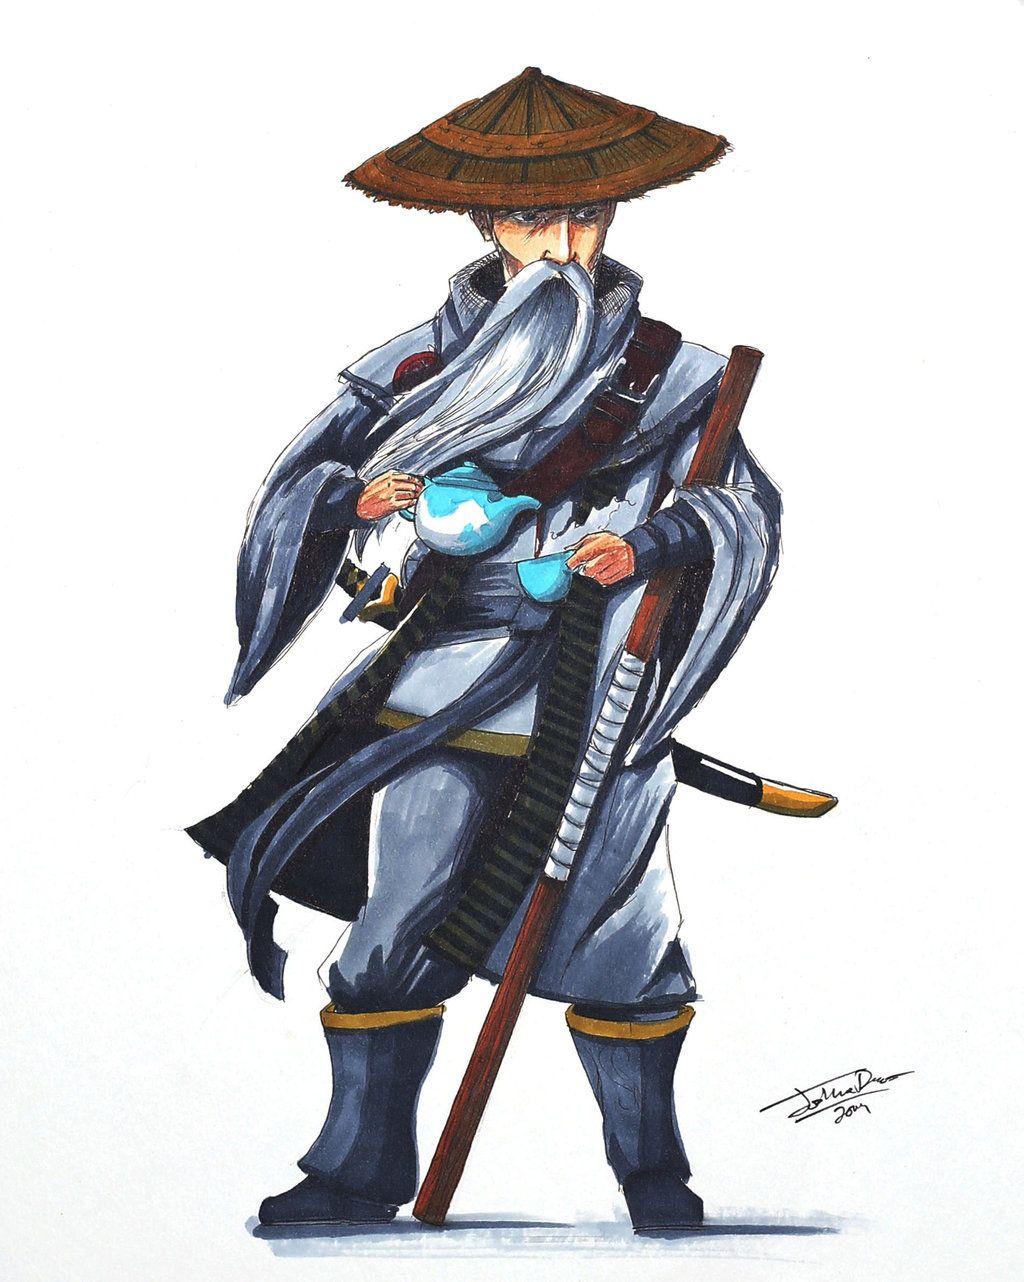 Sensei wu on deviantart - Sensei ninjago ...